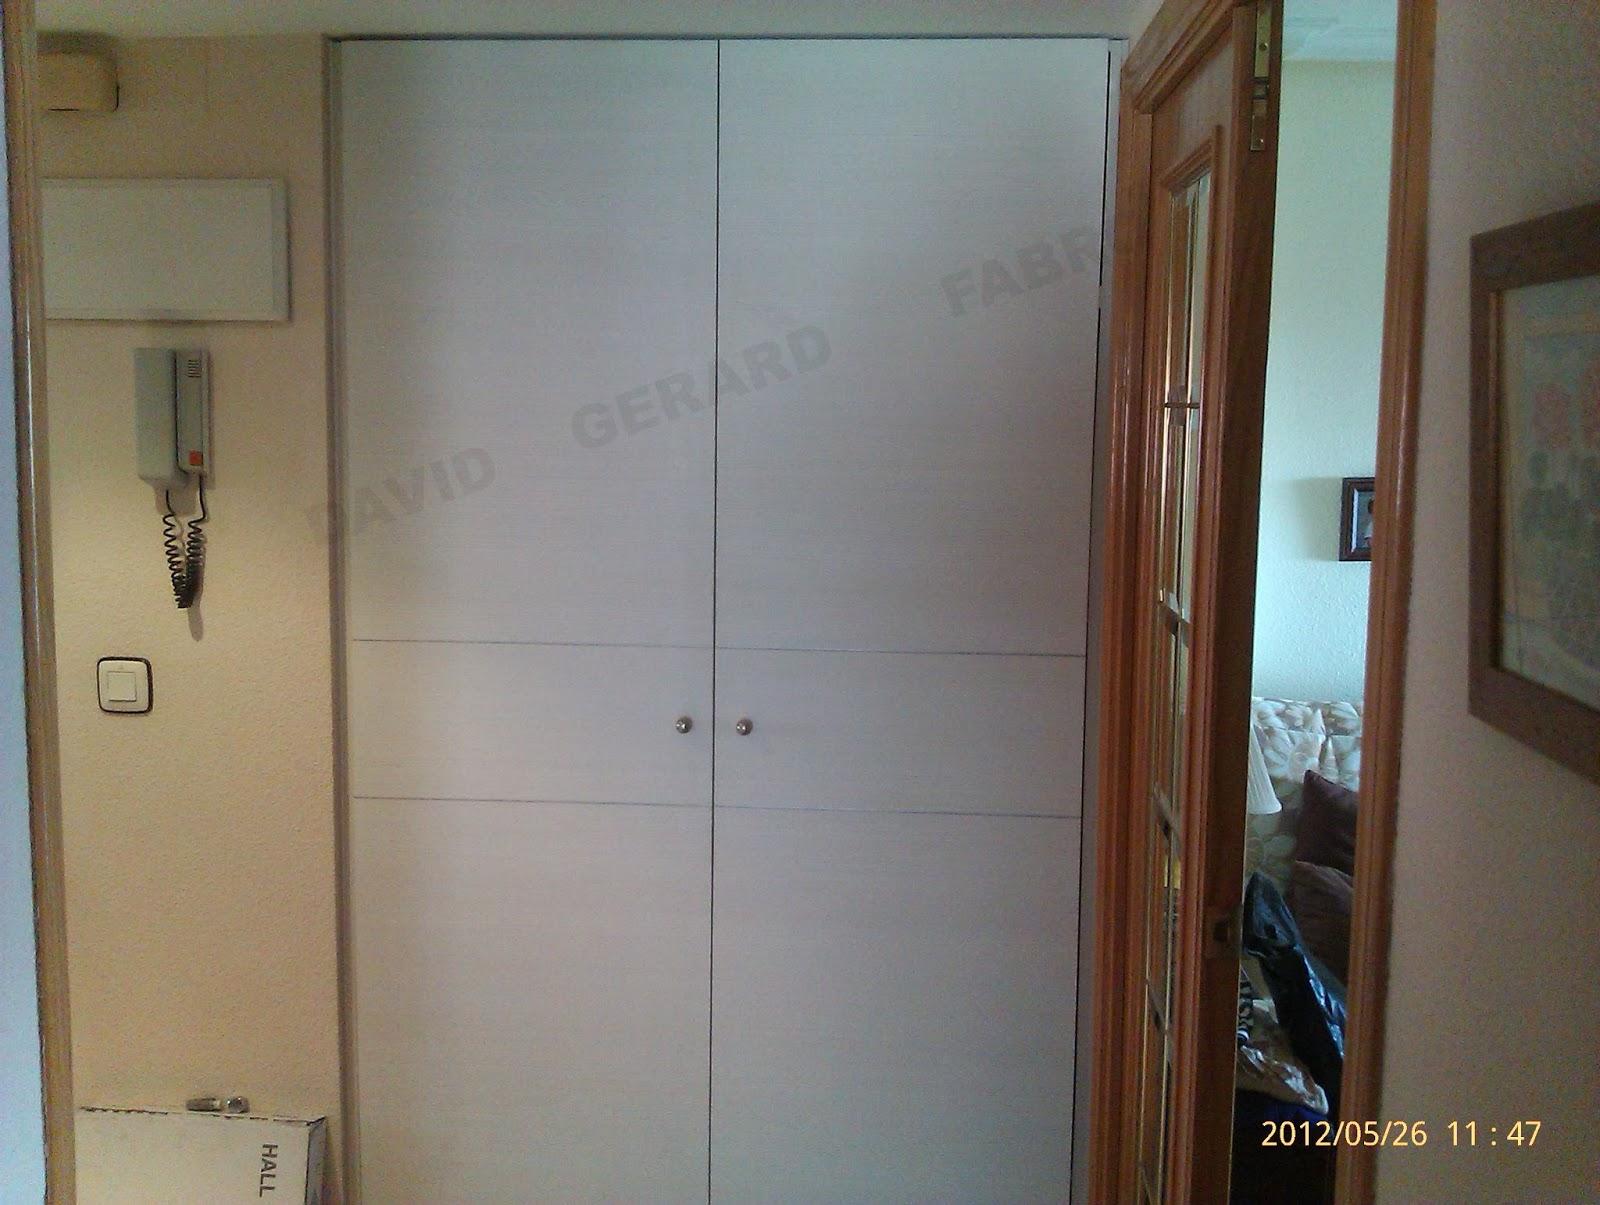 Puertas de armario con bisagras ocultas con adornos de aluminio.